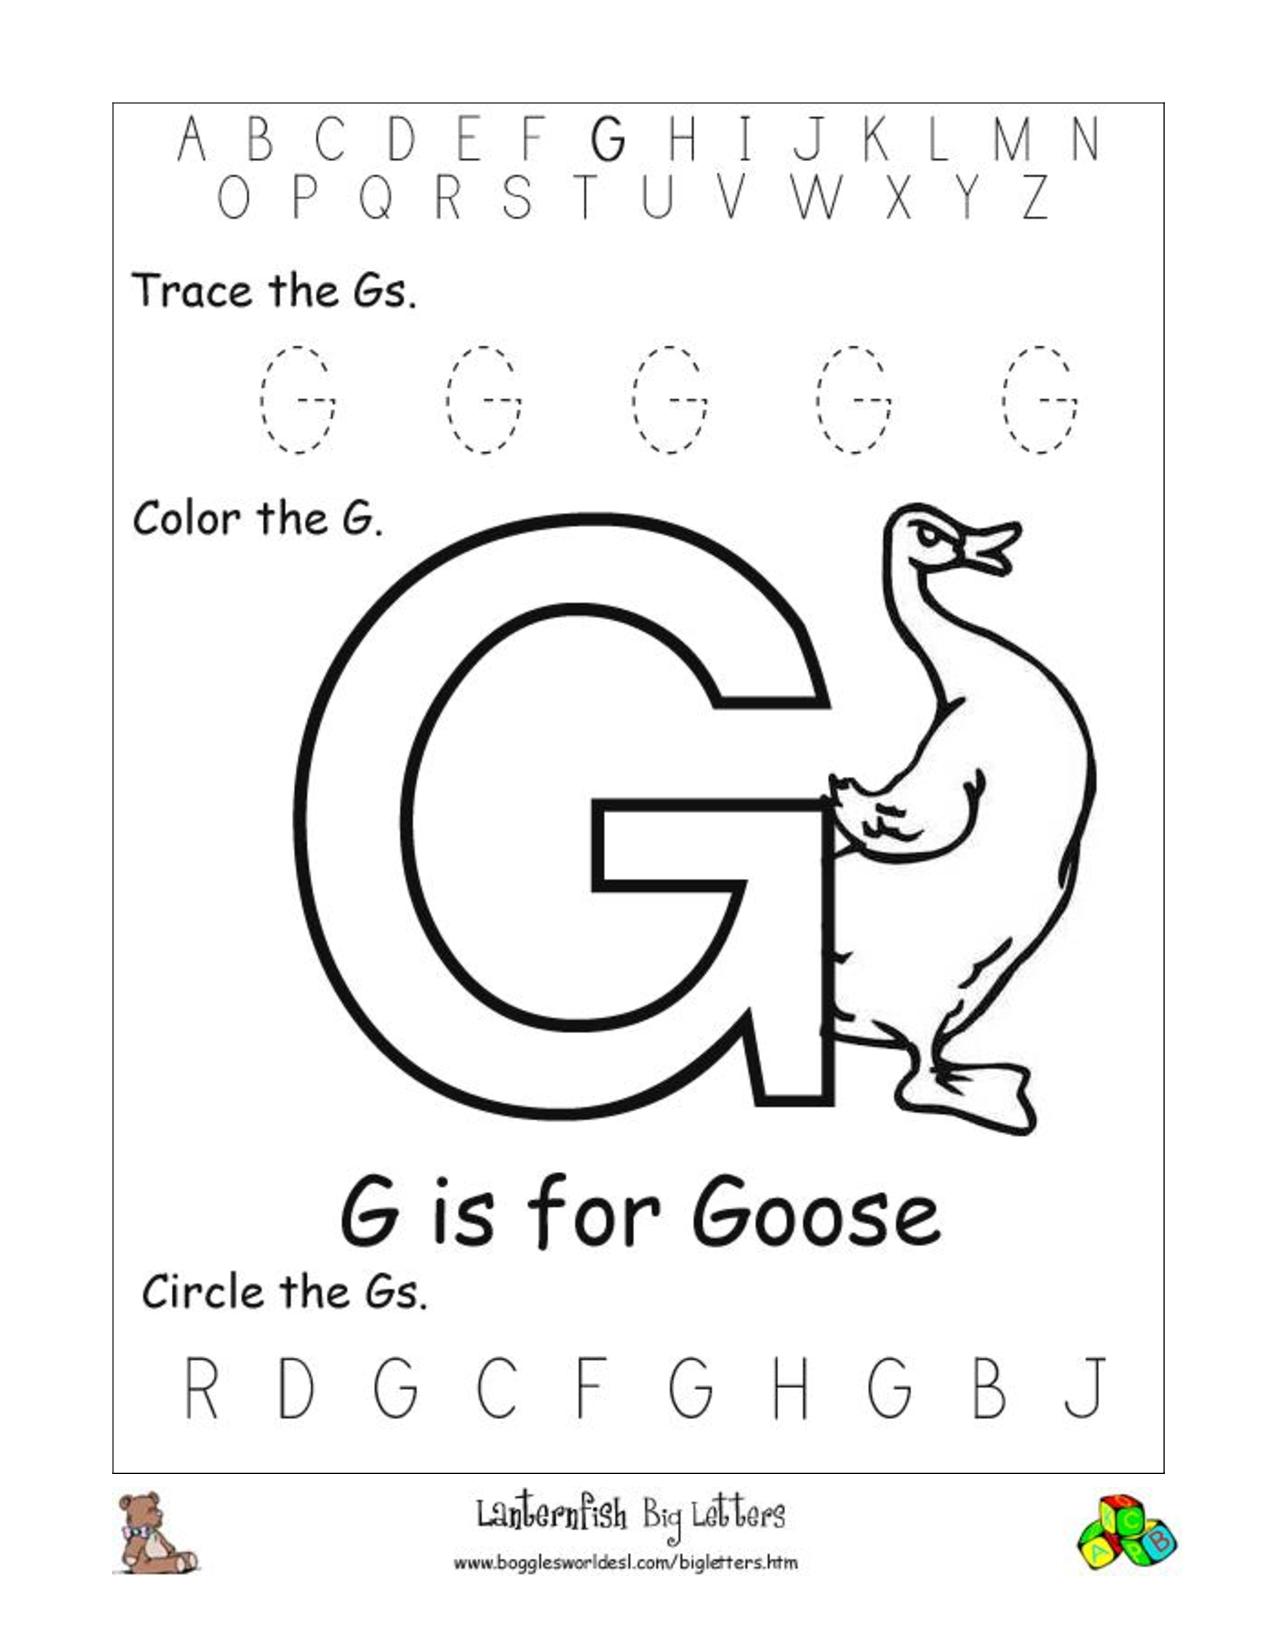 Alphabet Worksheets For Preschoolers | Alphabet Worksheet Big Letter | Letter G Printable Worksheets